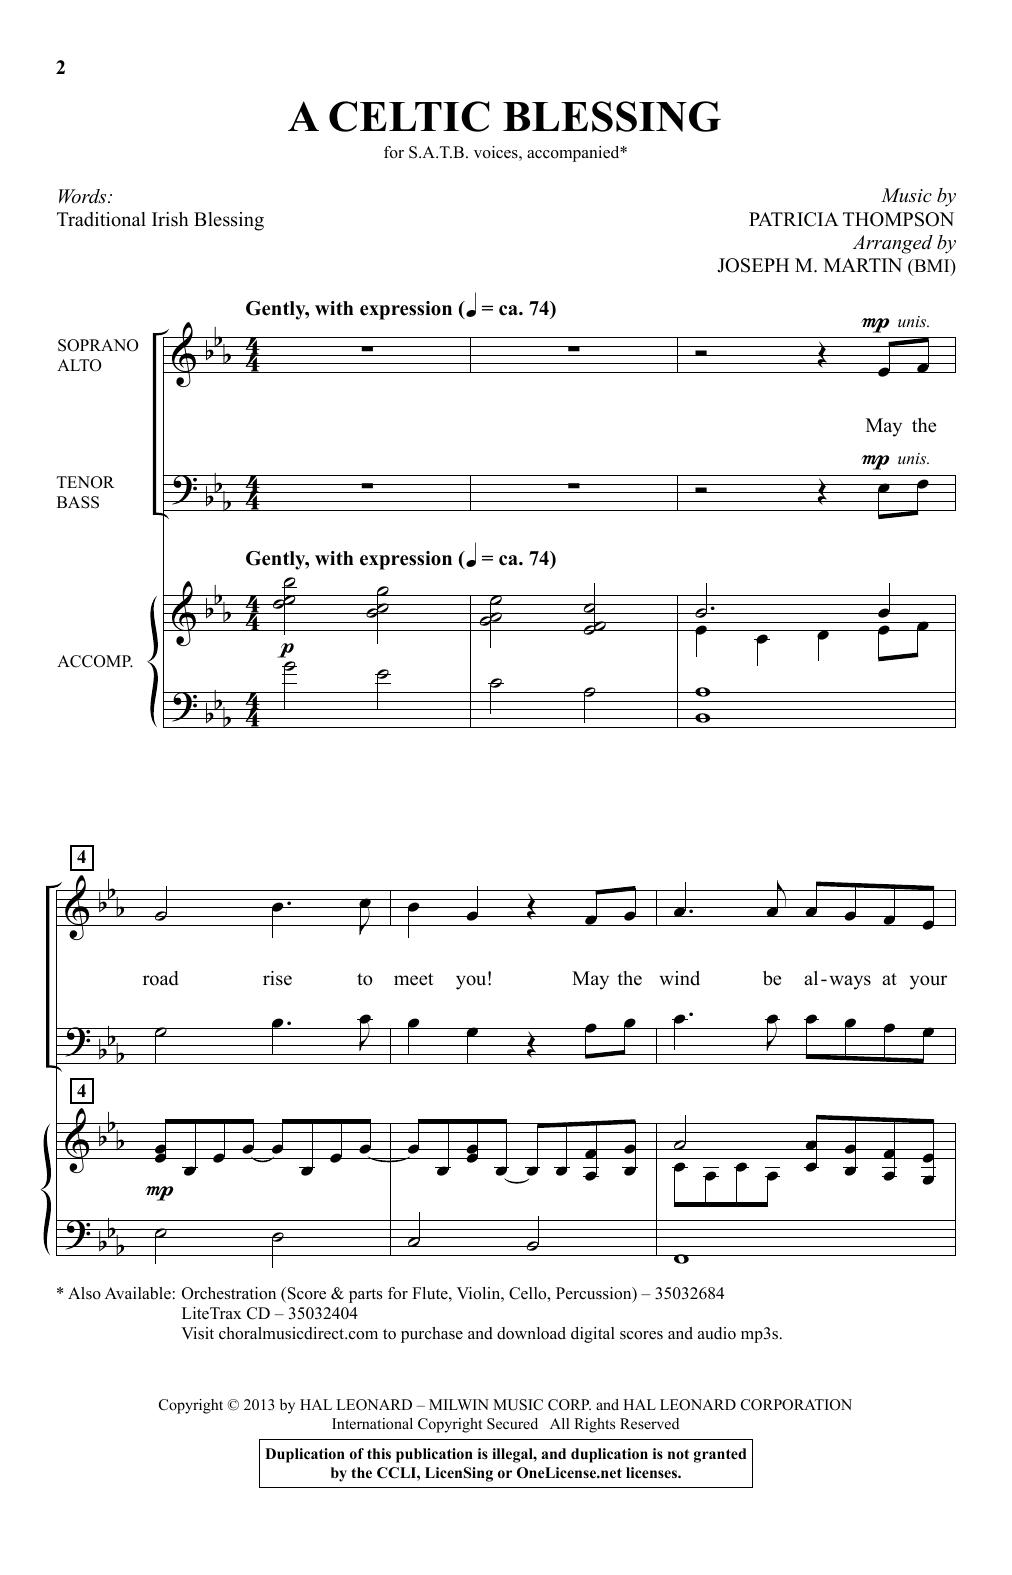 A Celtic Blessing (arr. Joseph M. Martin) (SATB Choir)